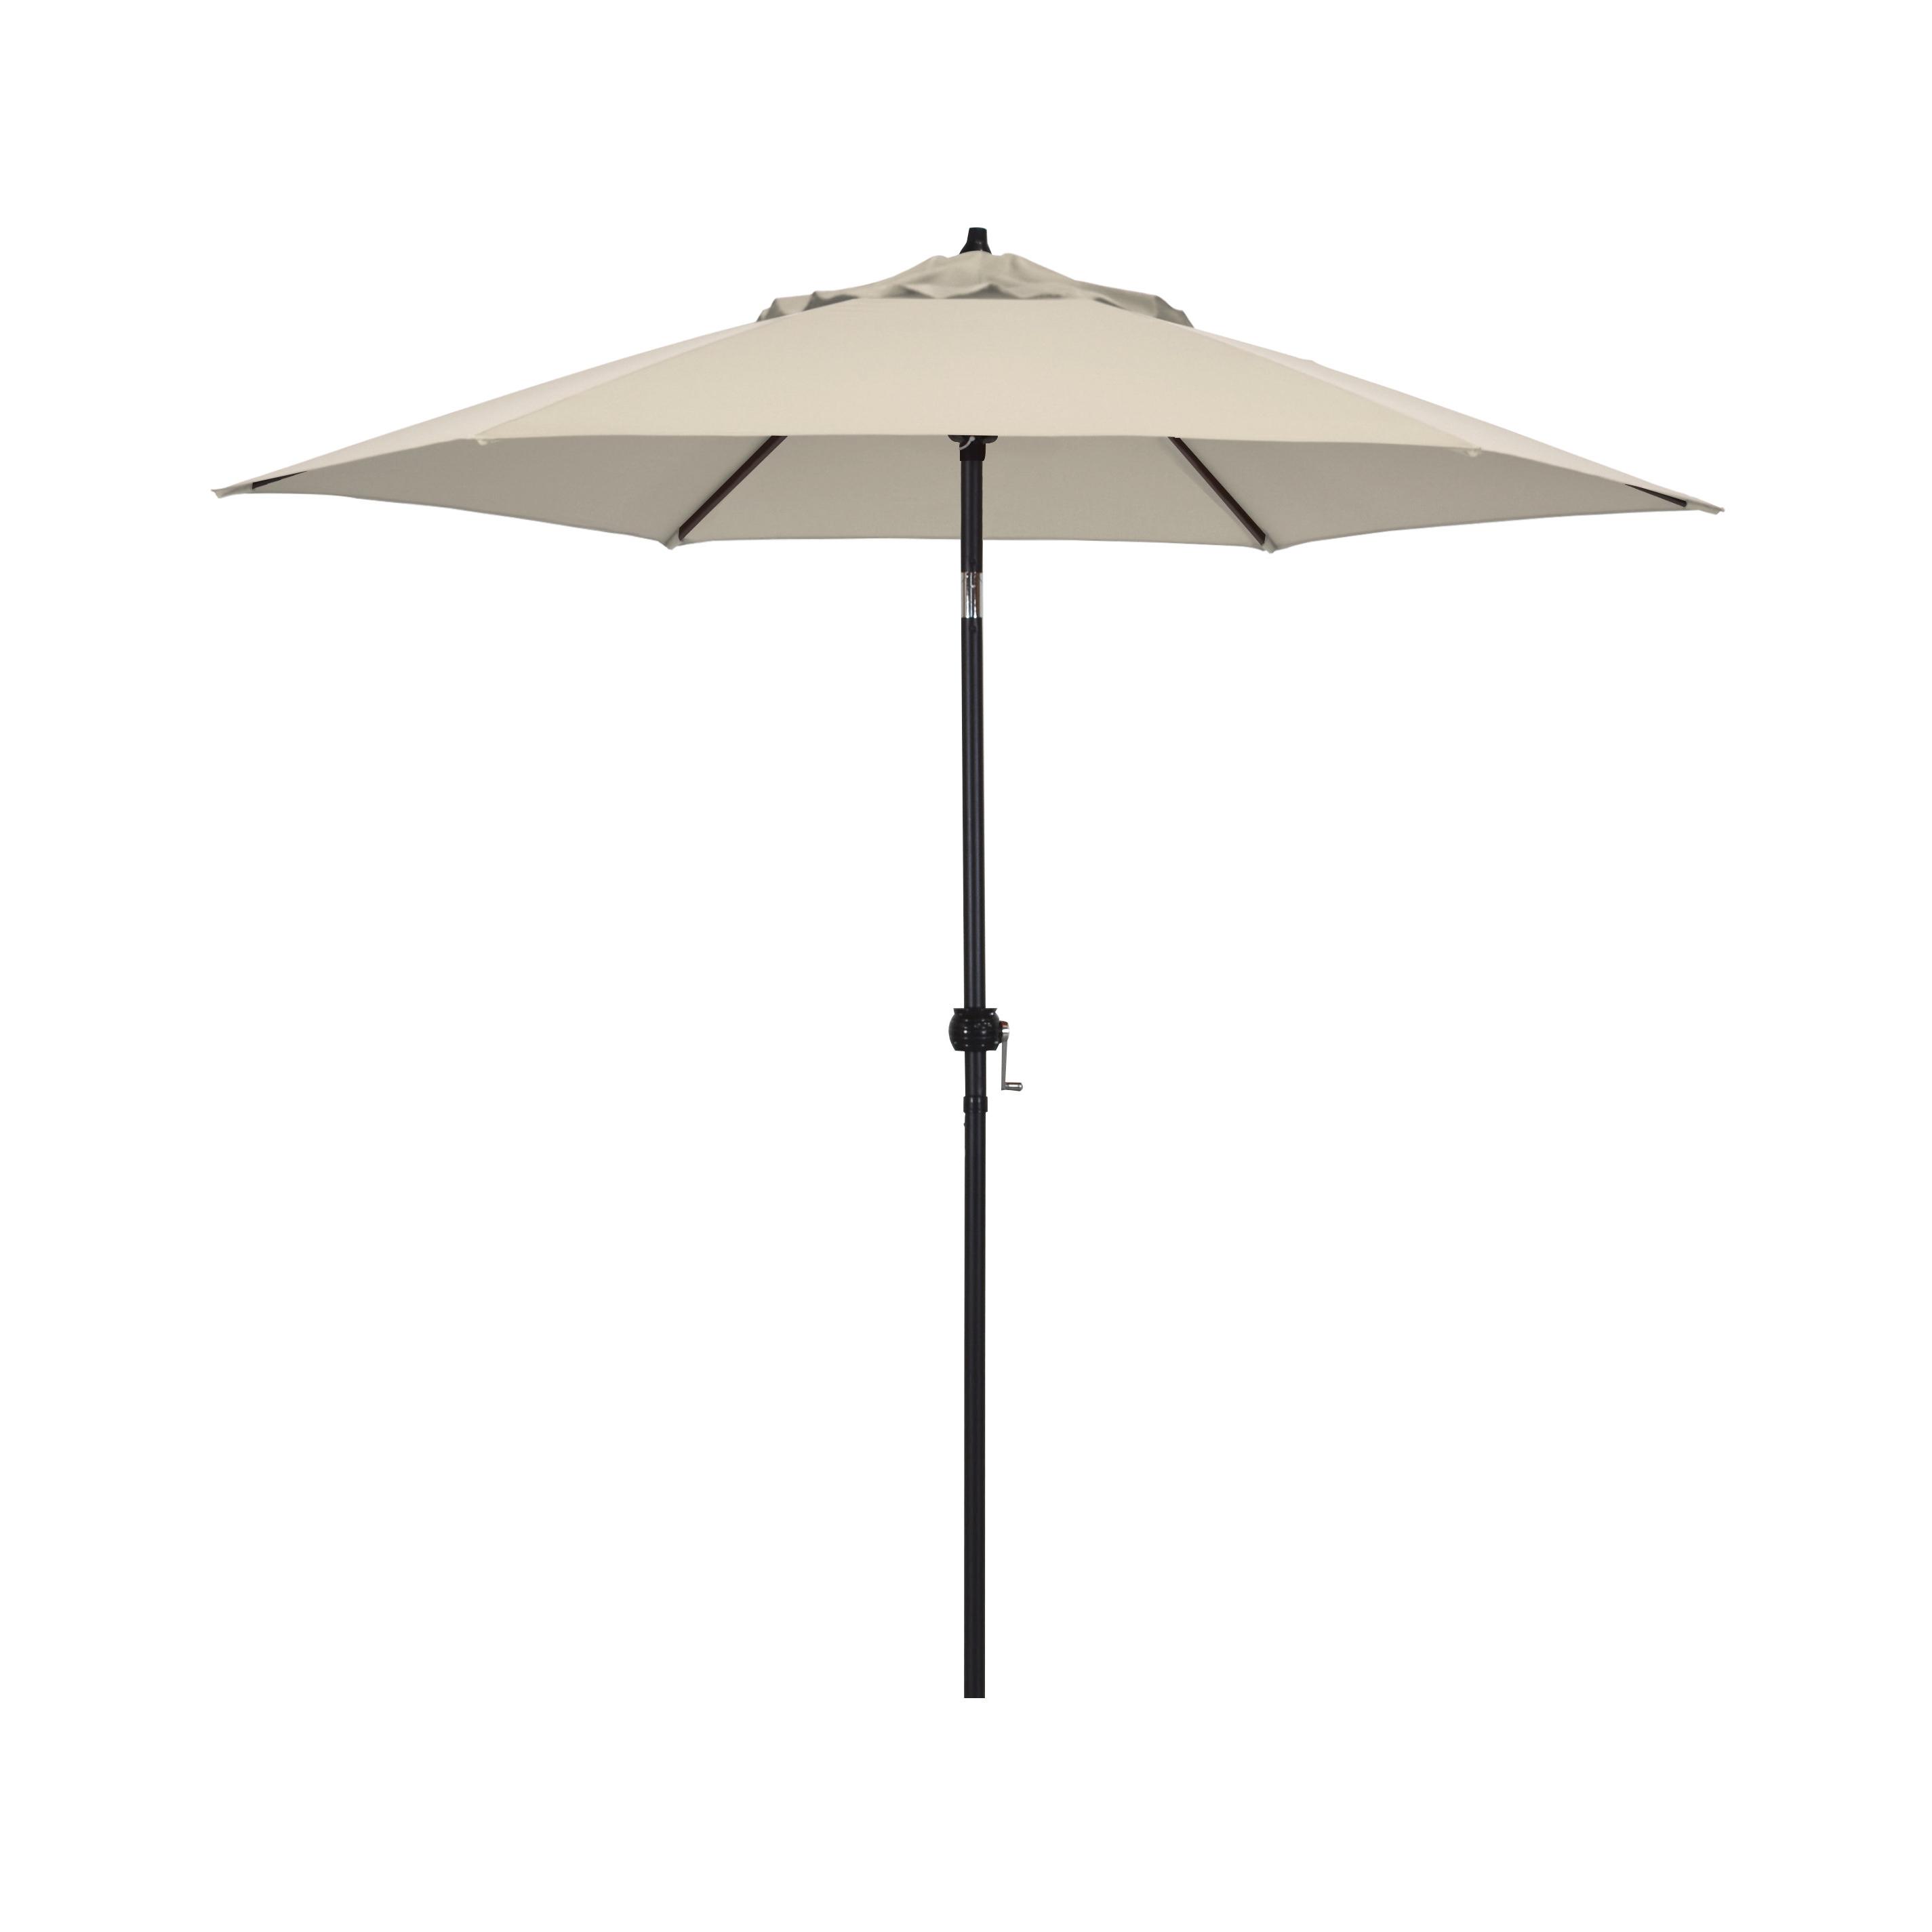 Mcdougal Market Umbrellas In Most Up To Date Kearney 9' Market Umbrella (Gallery 10 of 20)